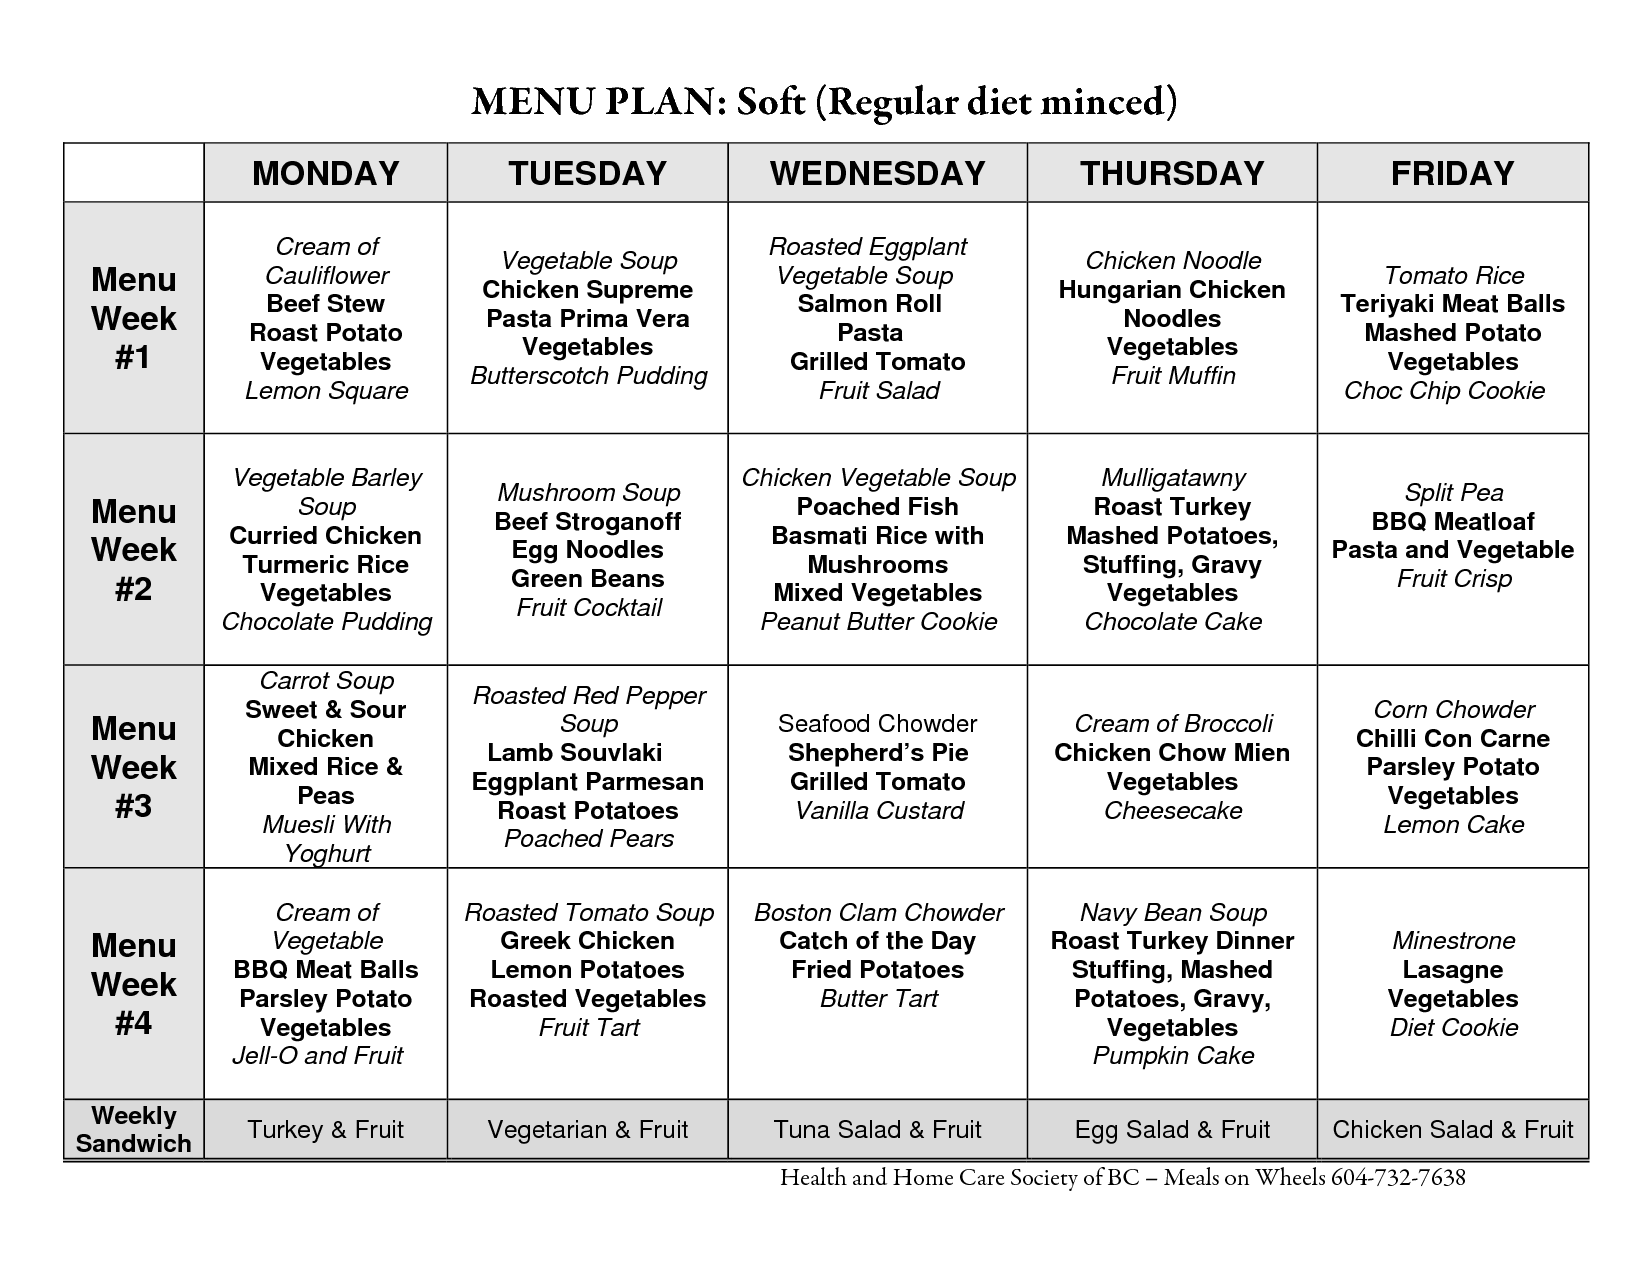 The atkins diet plan food list - Atkins Diet Plan Food List Induction Menu Atkins Diet Atkins Everything Atkins Diet Information Breakfast